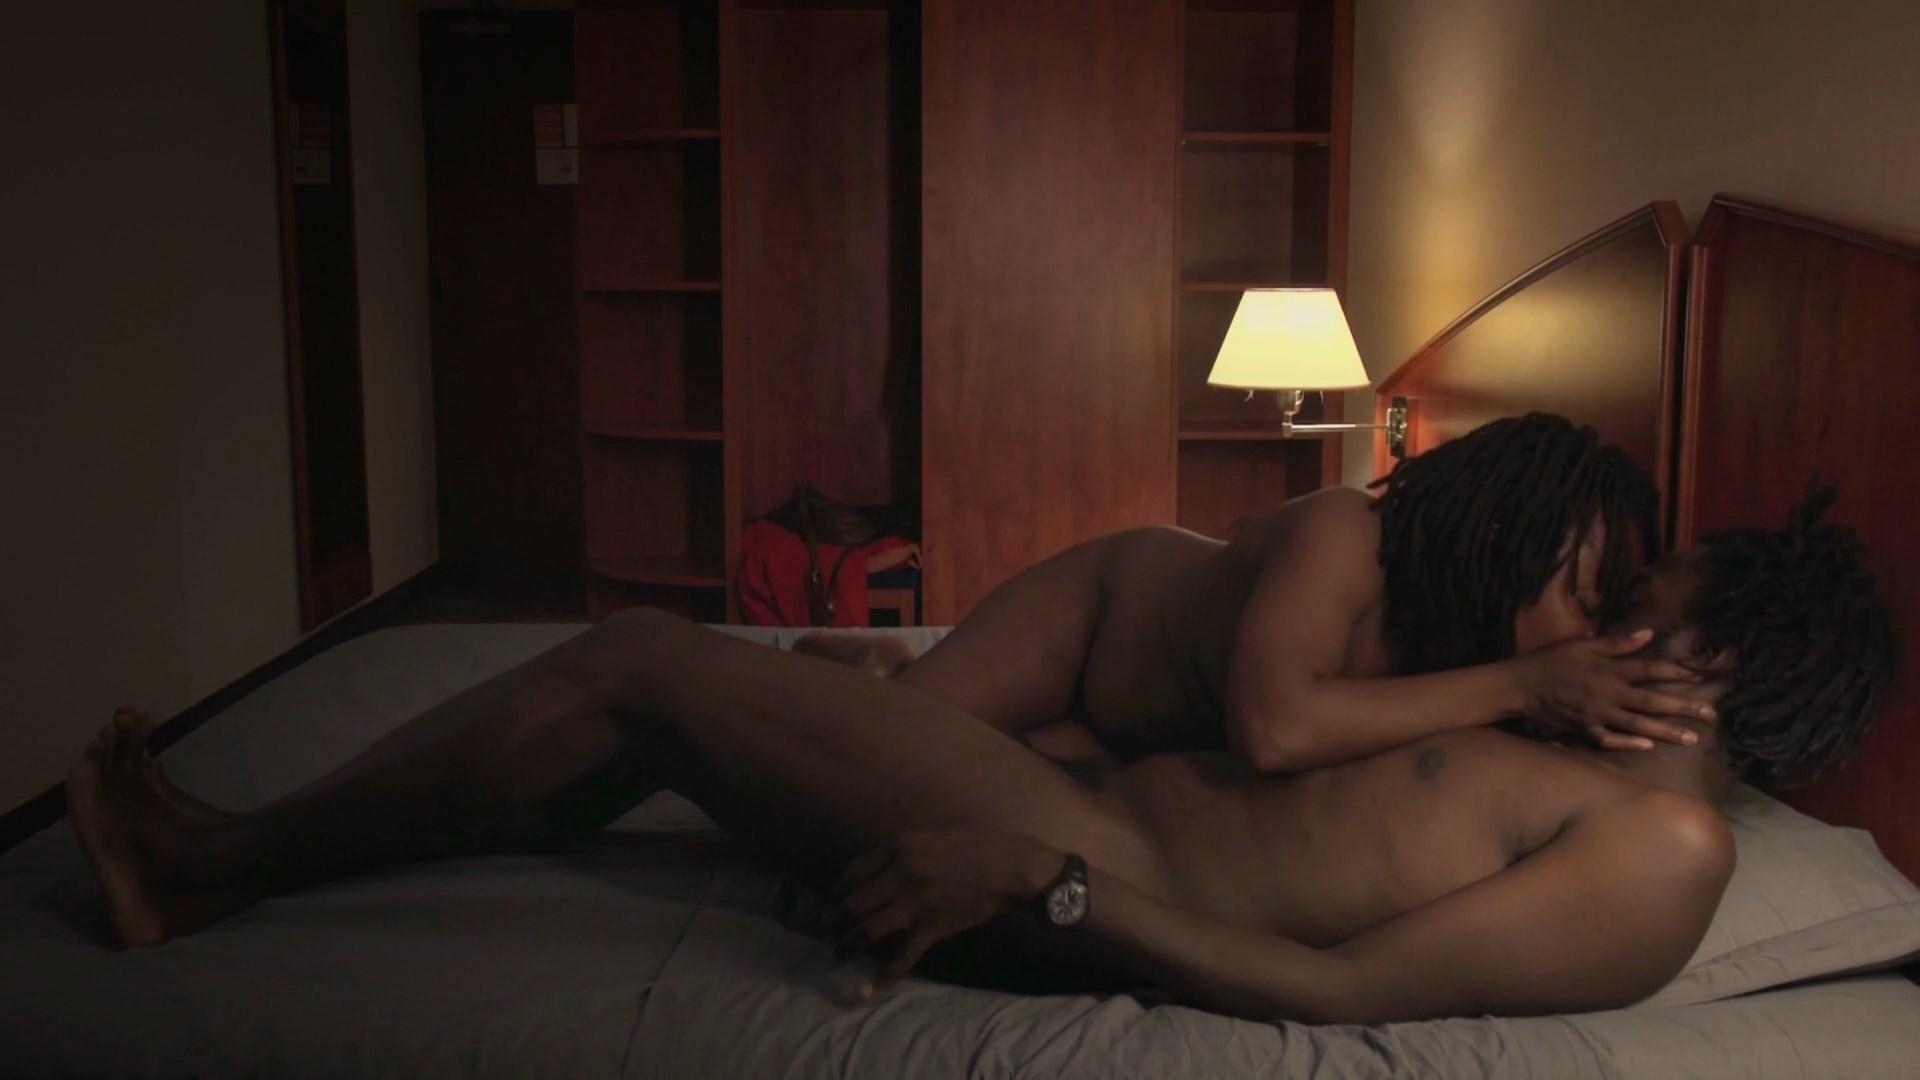 Ana Ayora Nude 2013 » page 7 » celebs nude video - nudecelebvideo